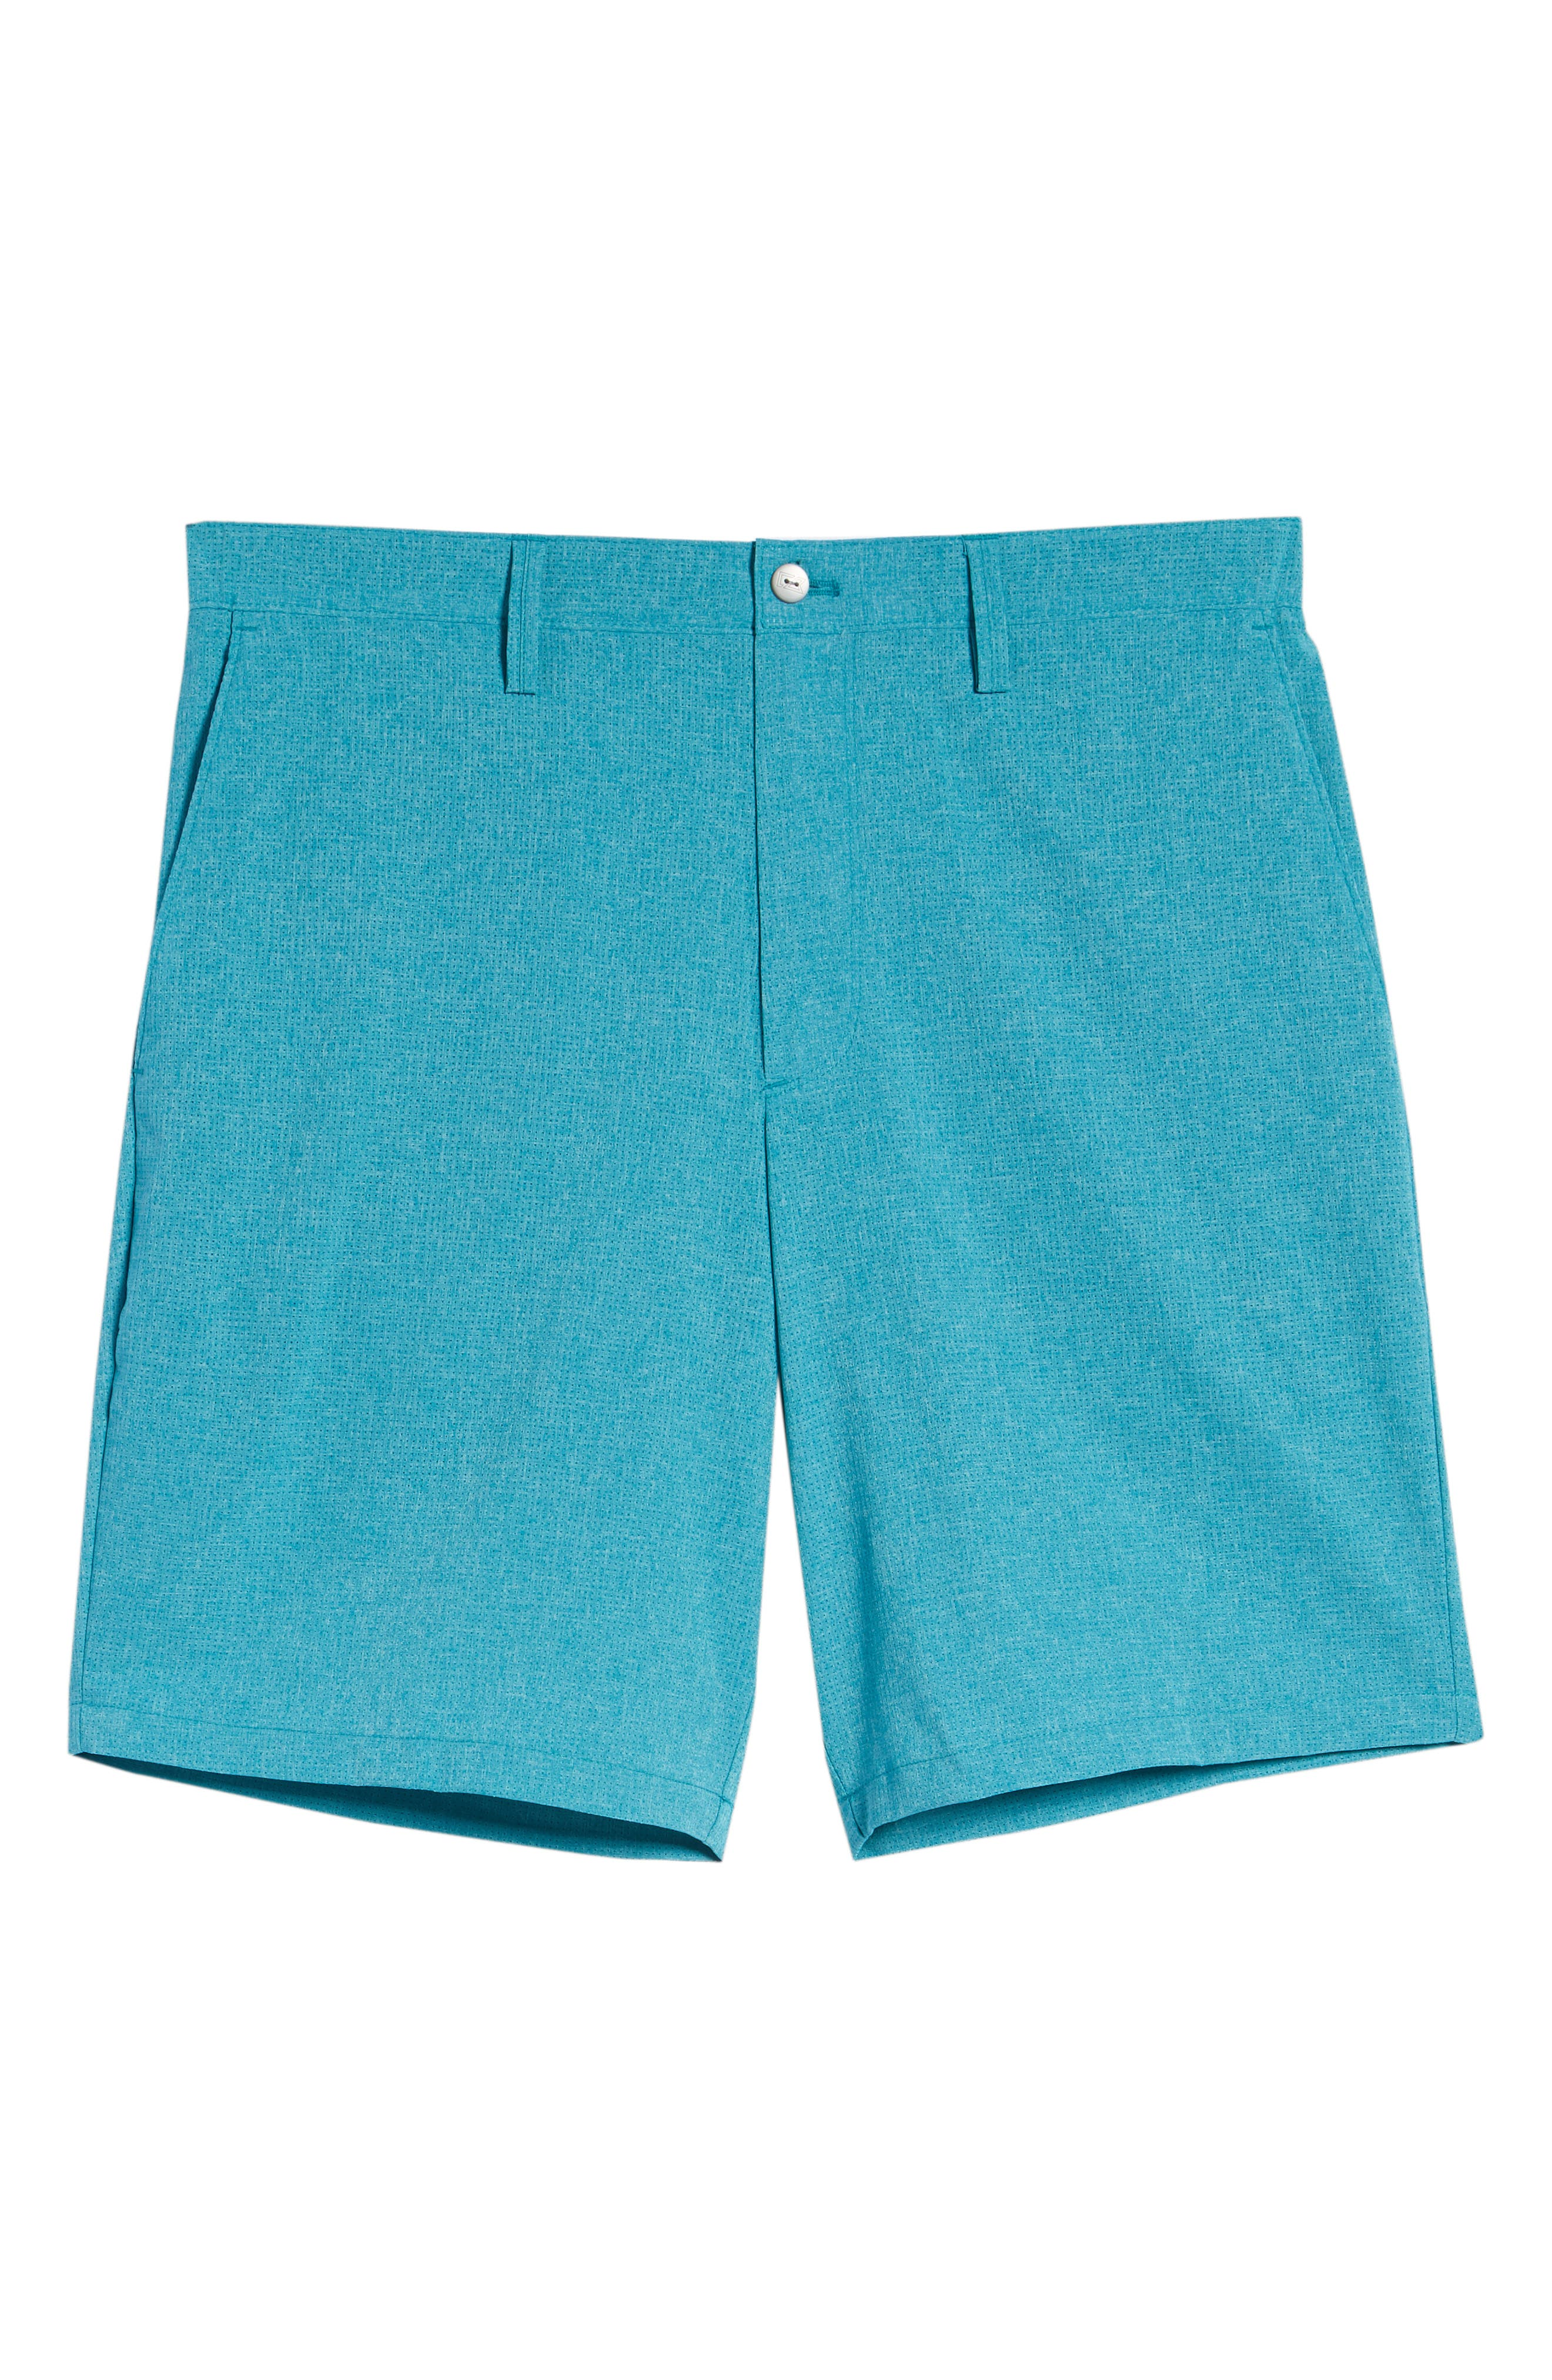 Trevor DryTec Golf Shorts,                             Alternate thumbnail 6, color,                             AQUATIC